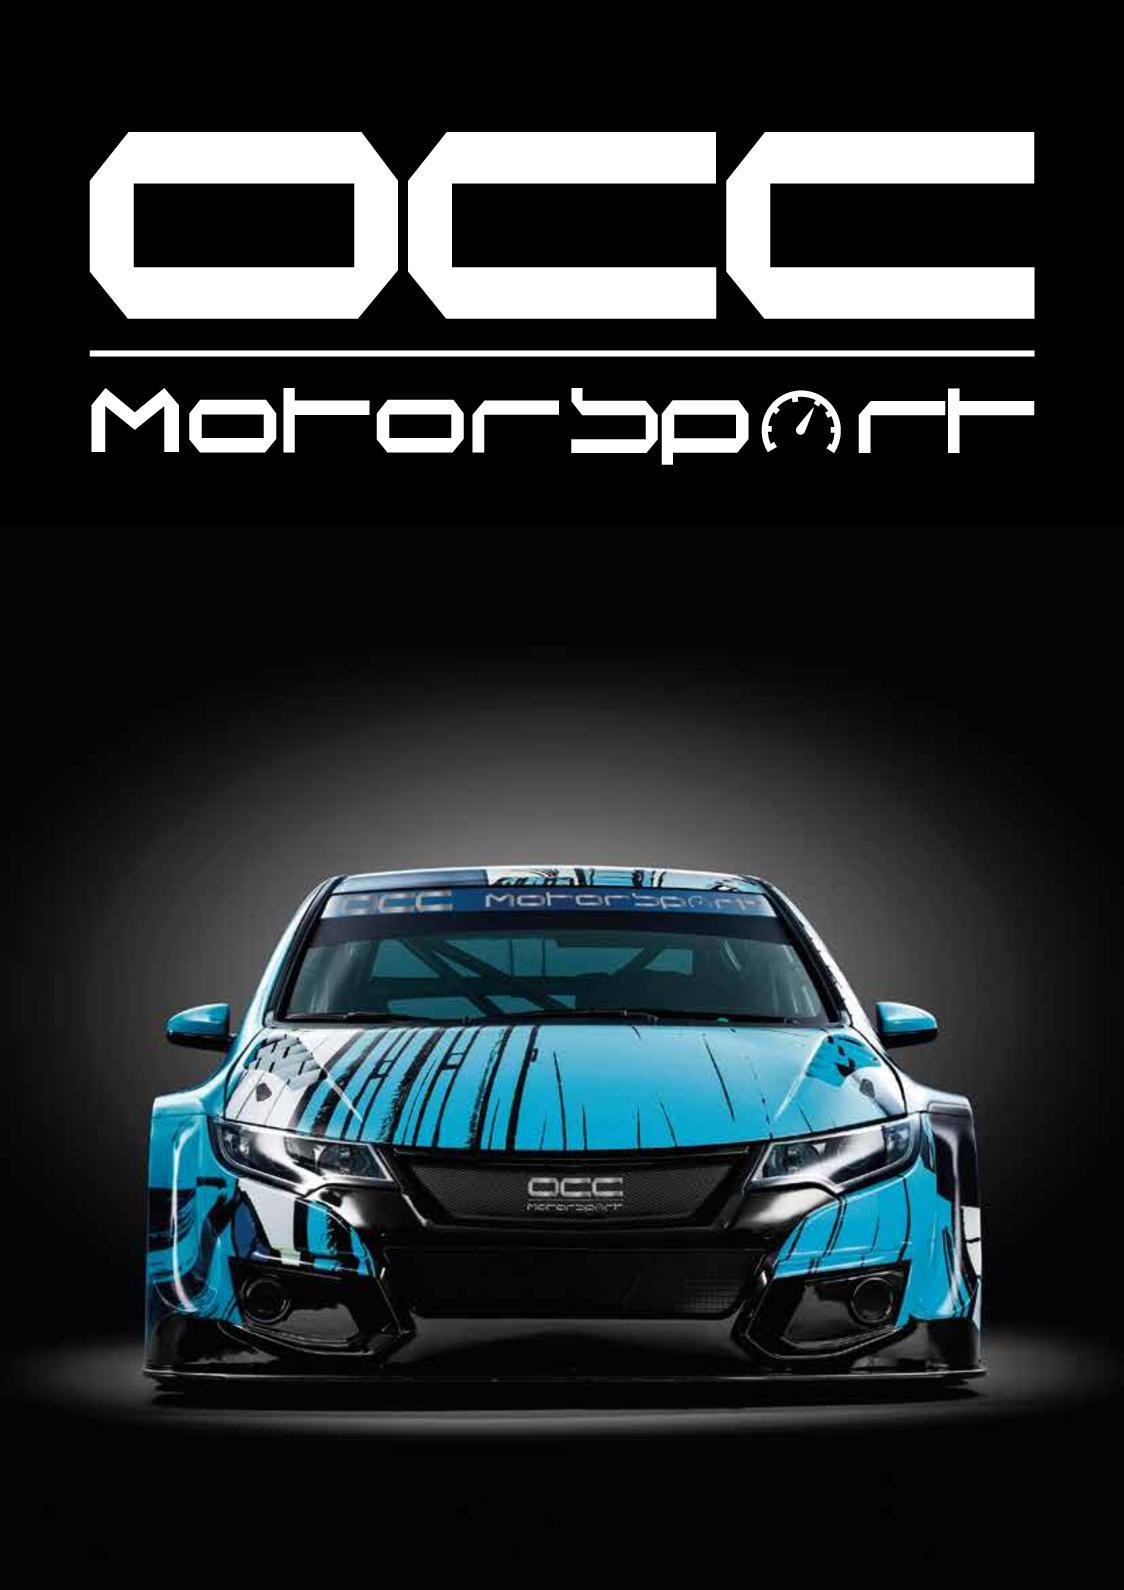 Occ Motorsport occrc006/CIERRRE Capo Aero Black